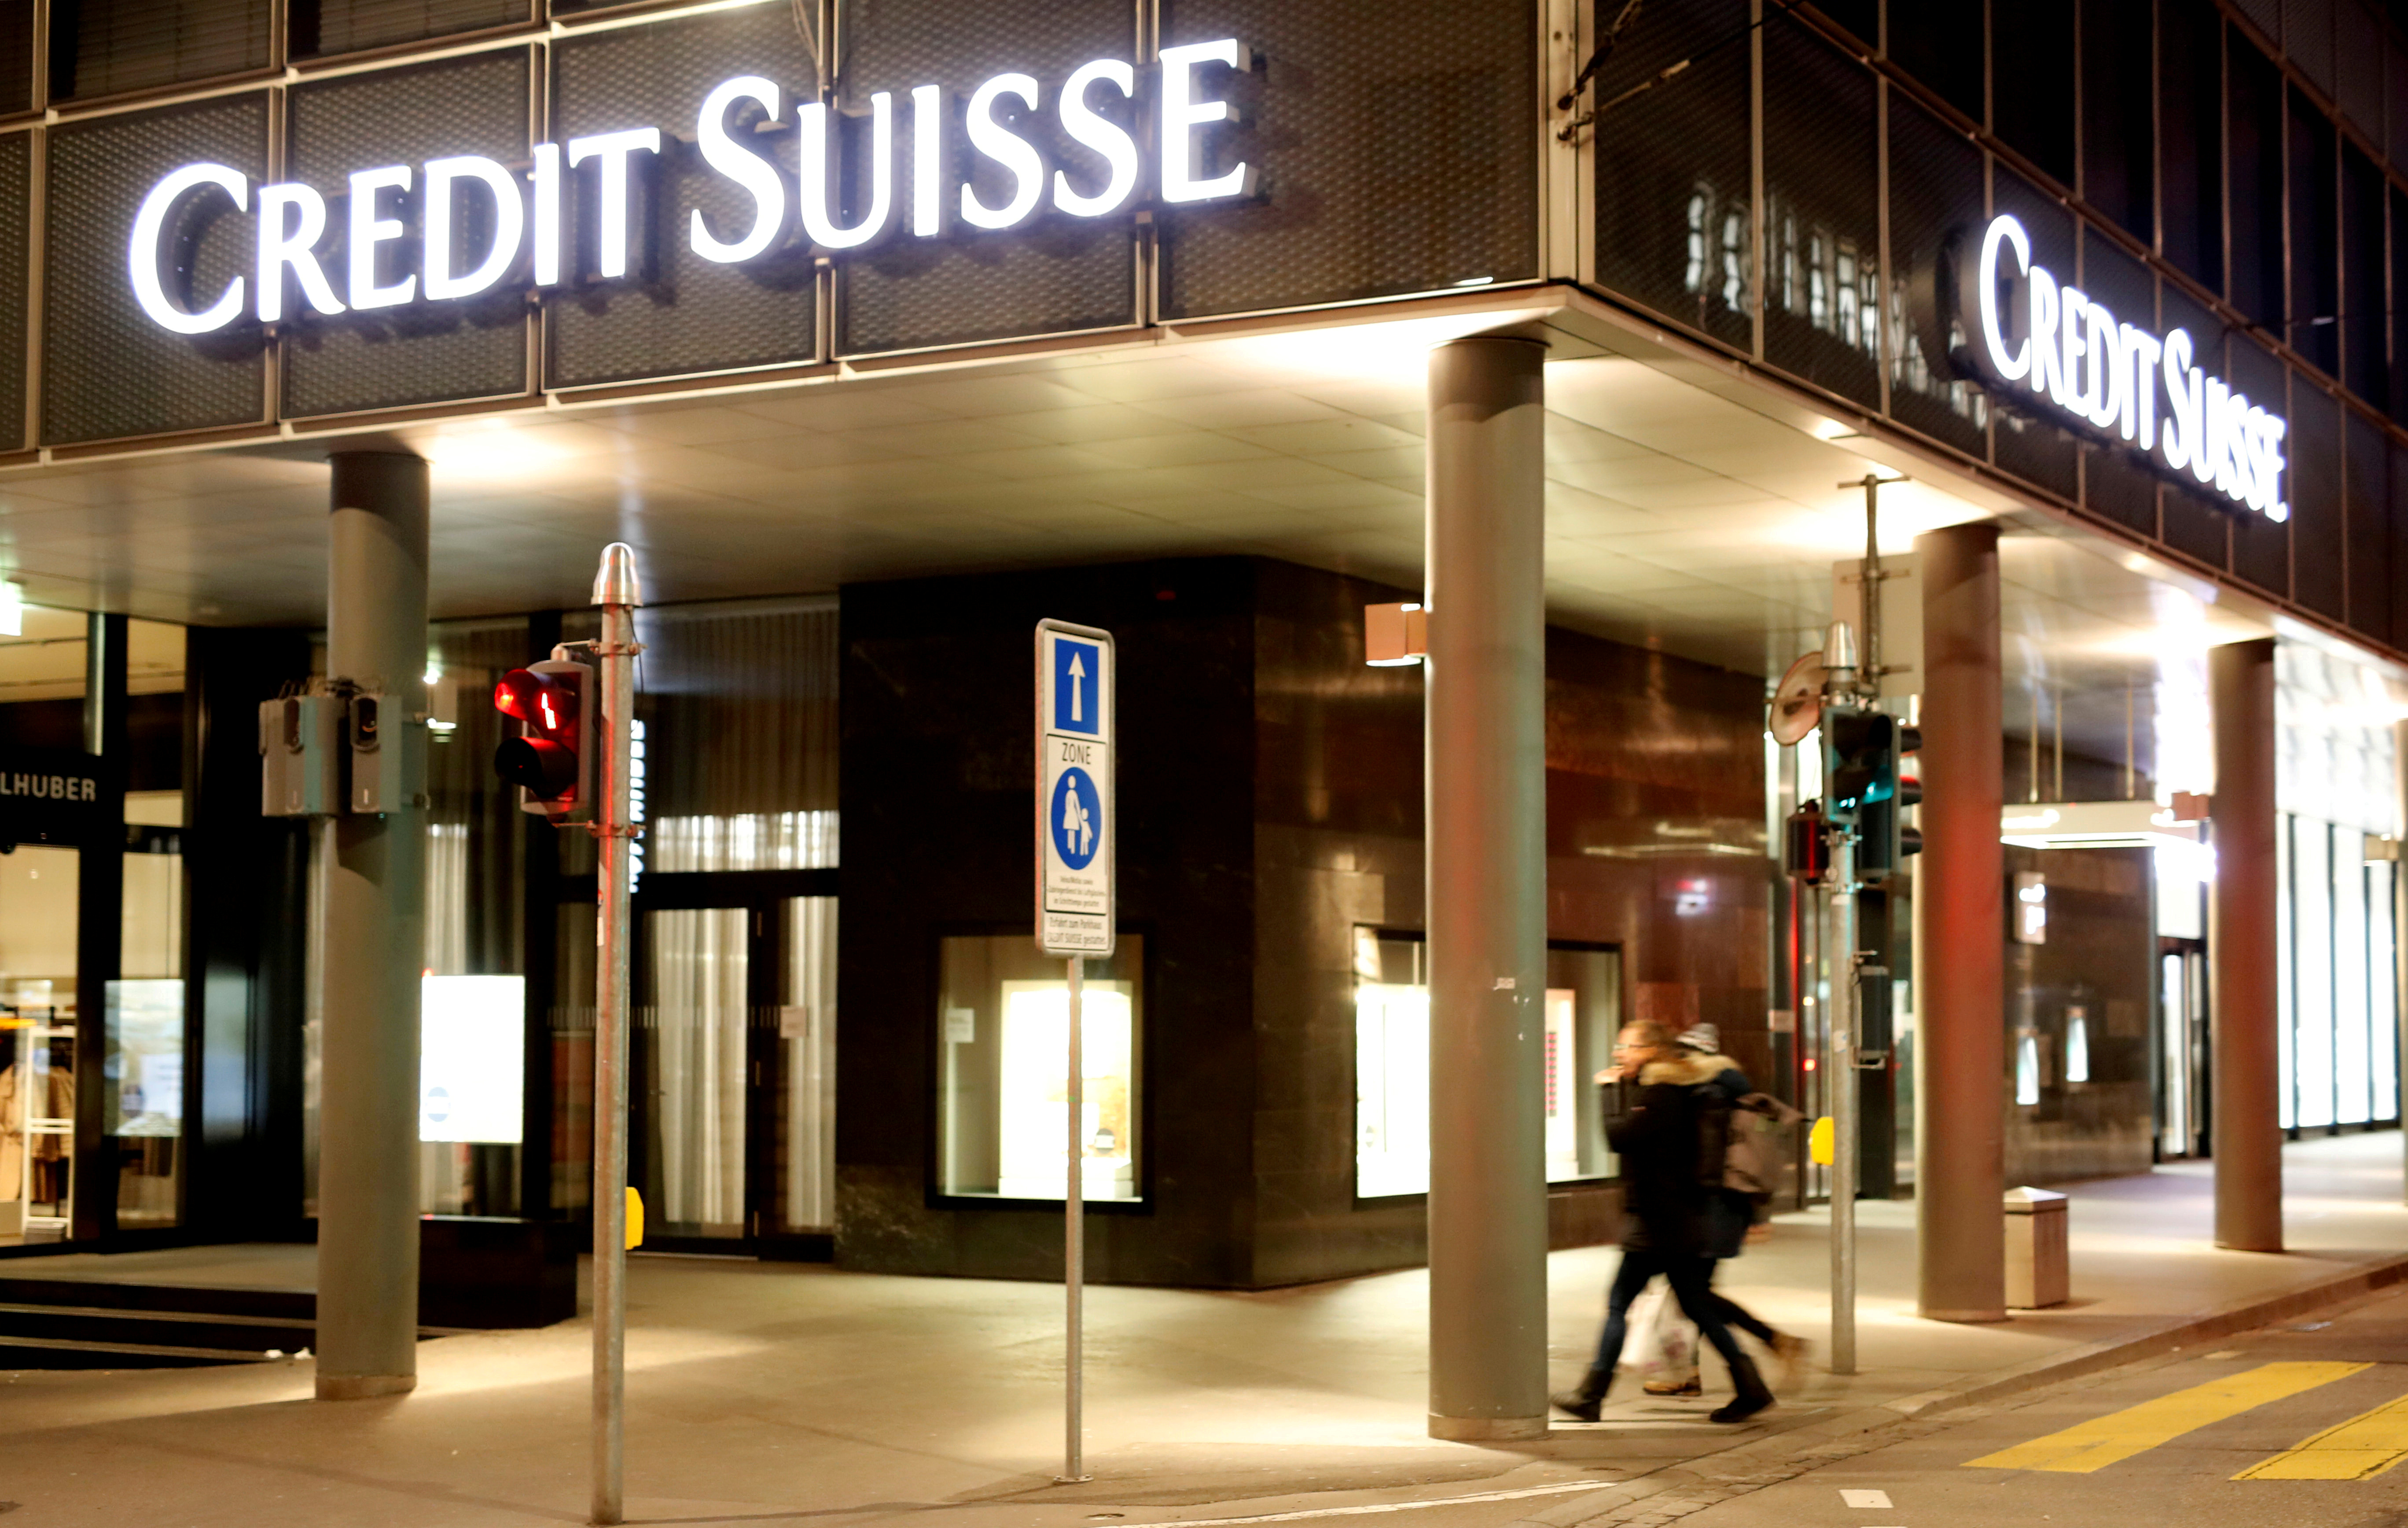 Spies and lies regulators round on Credit Suisse   Reuters